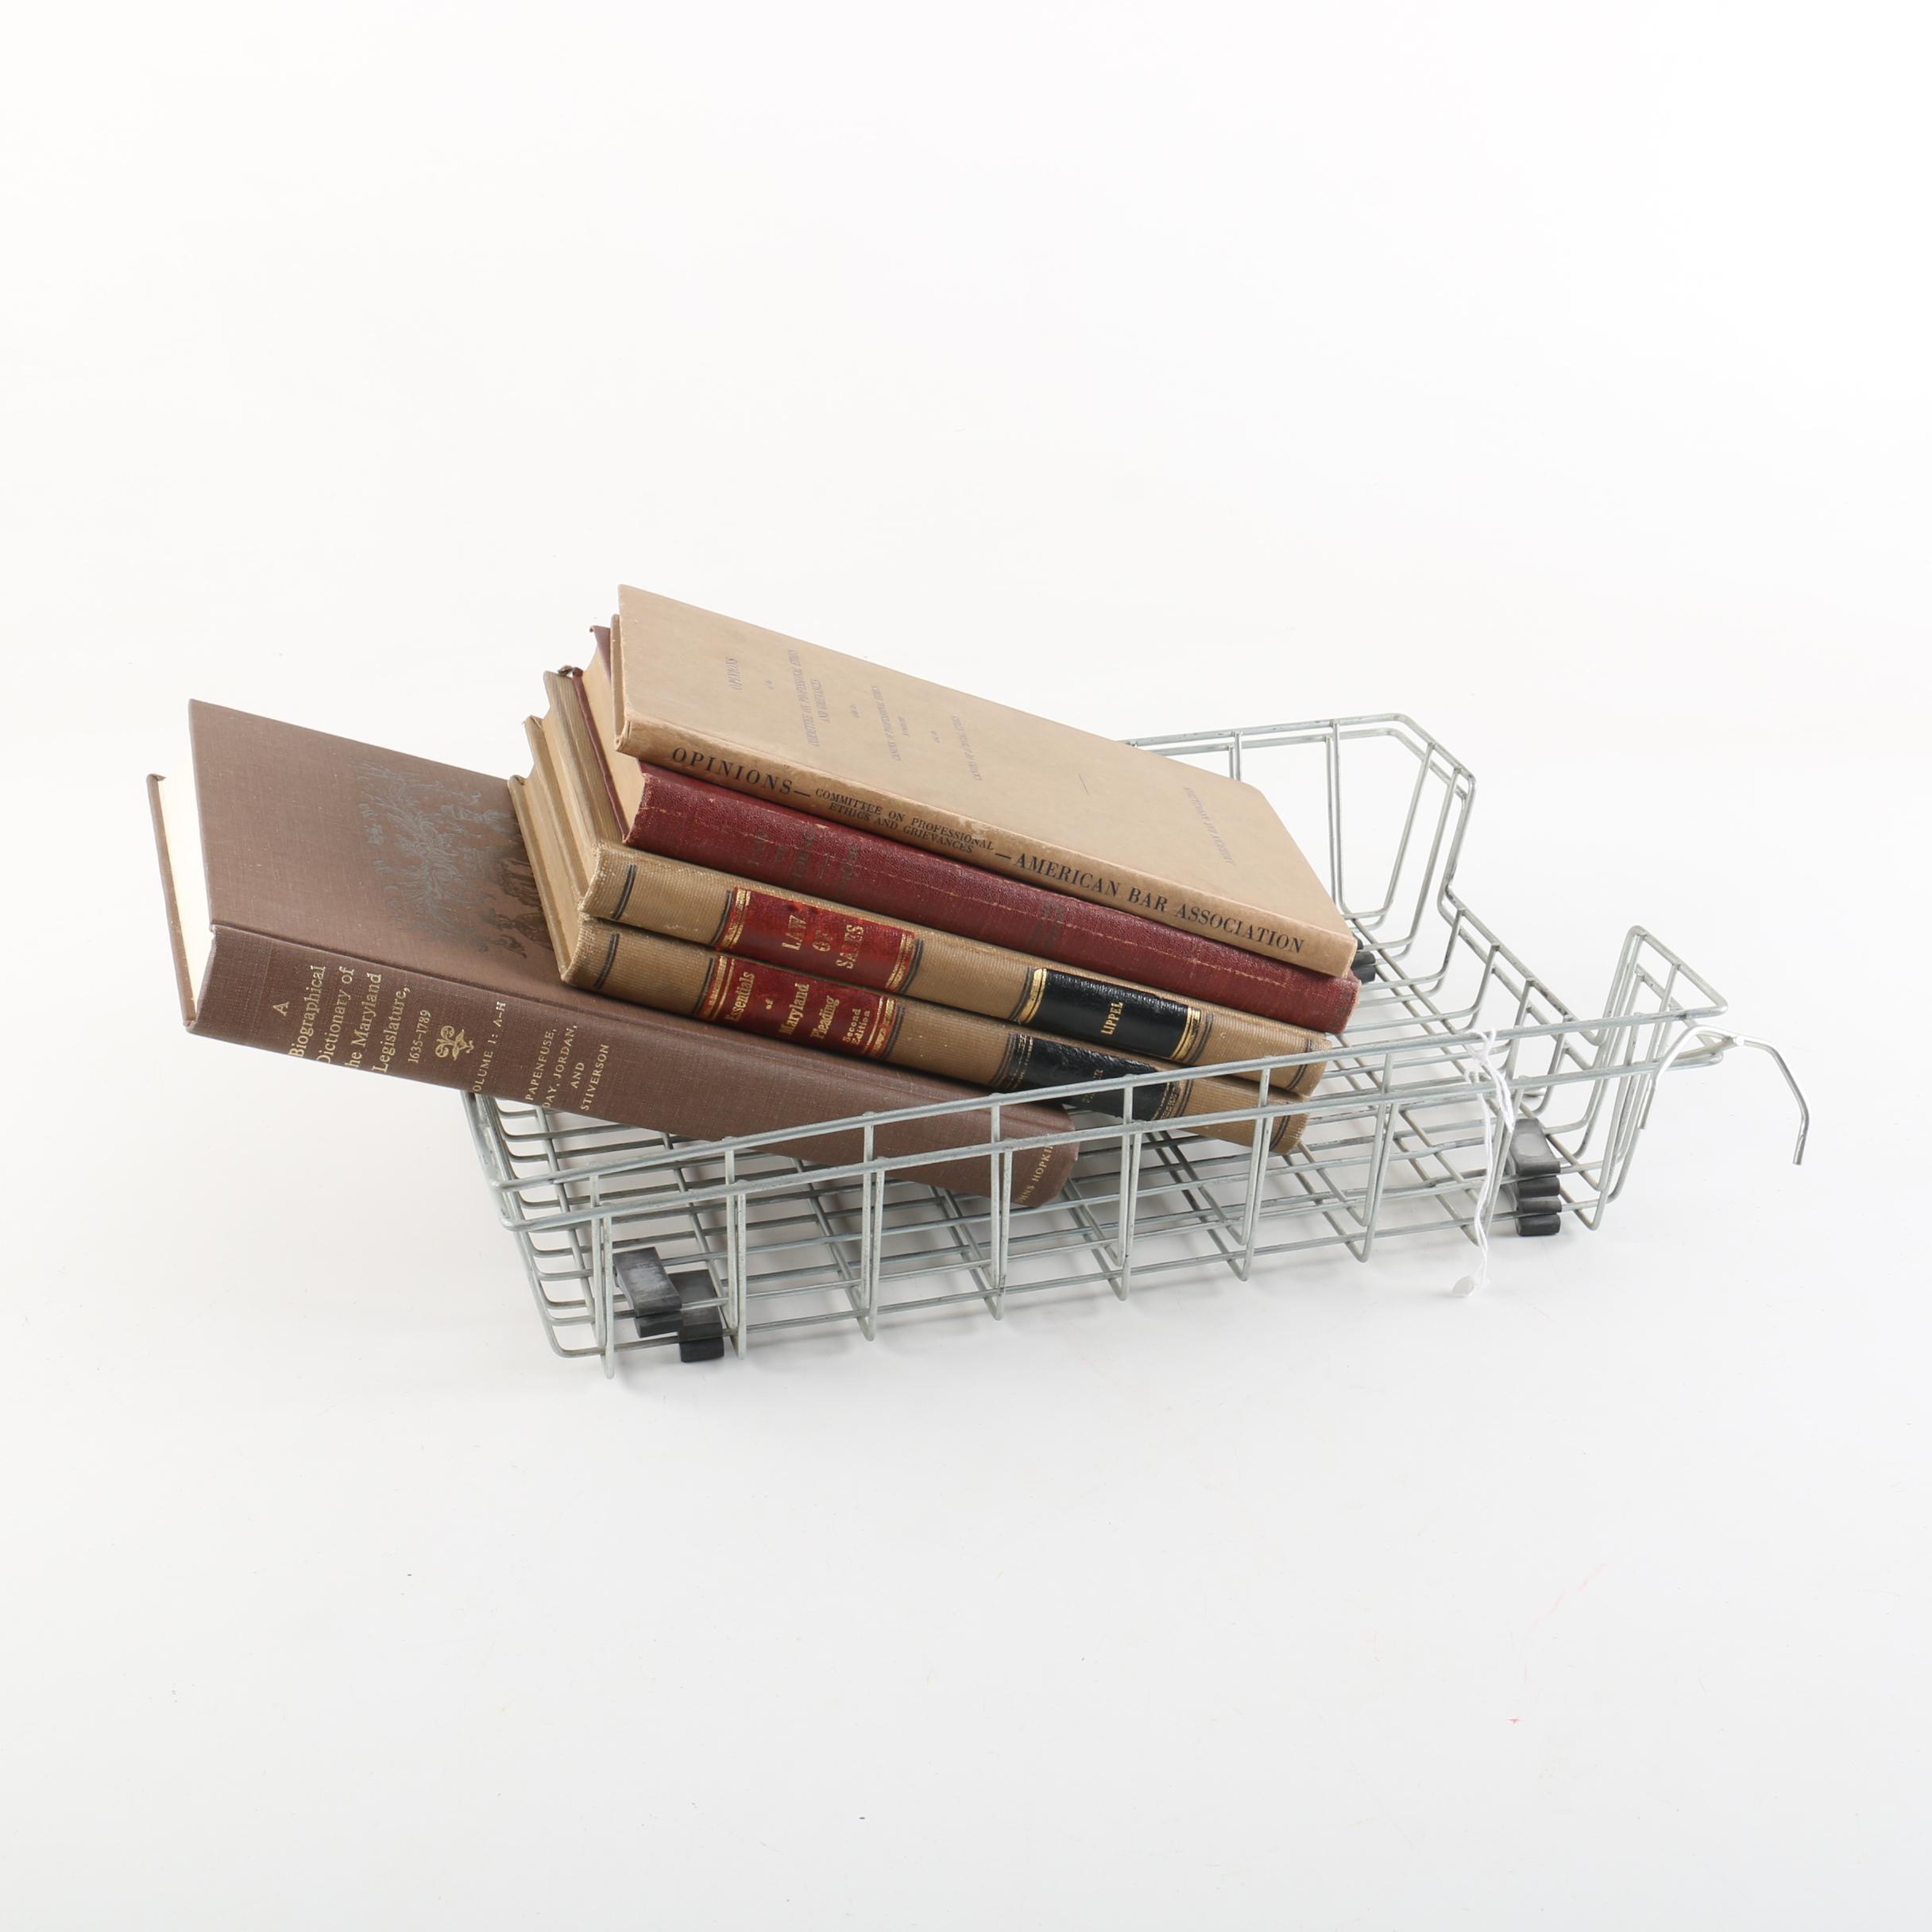 1920s-1980s Legal Books